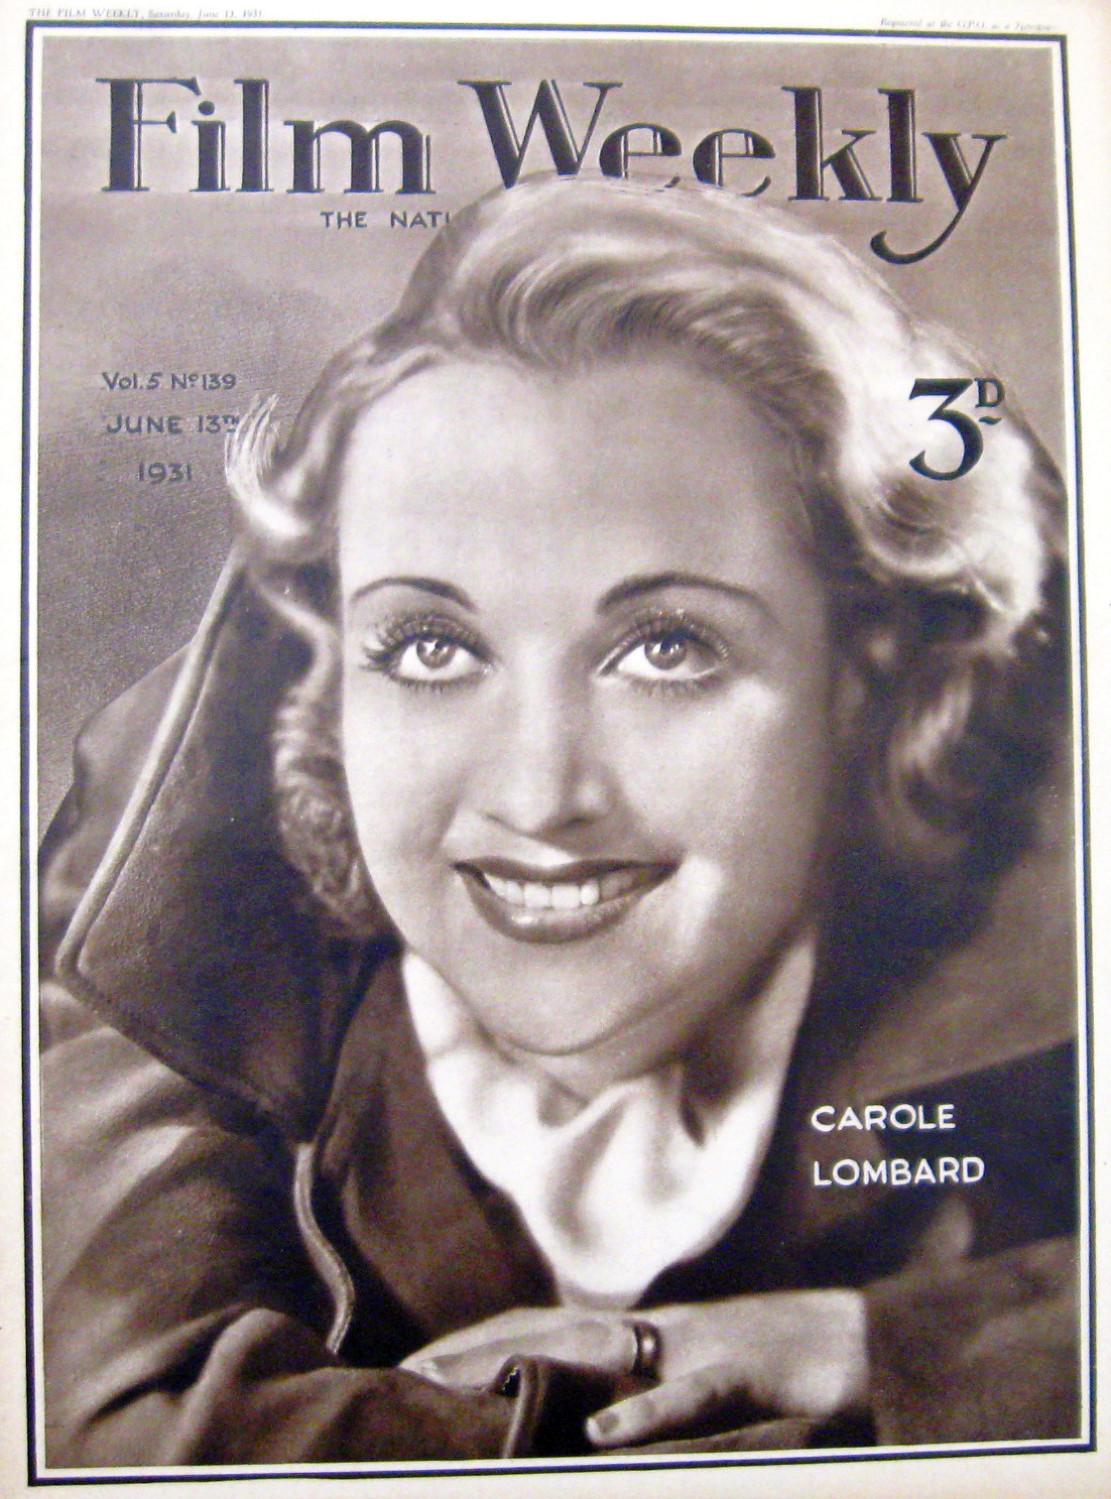 carole lombard film weekly 061331aa